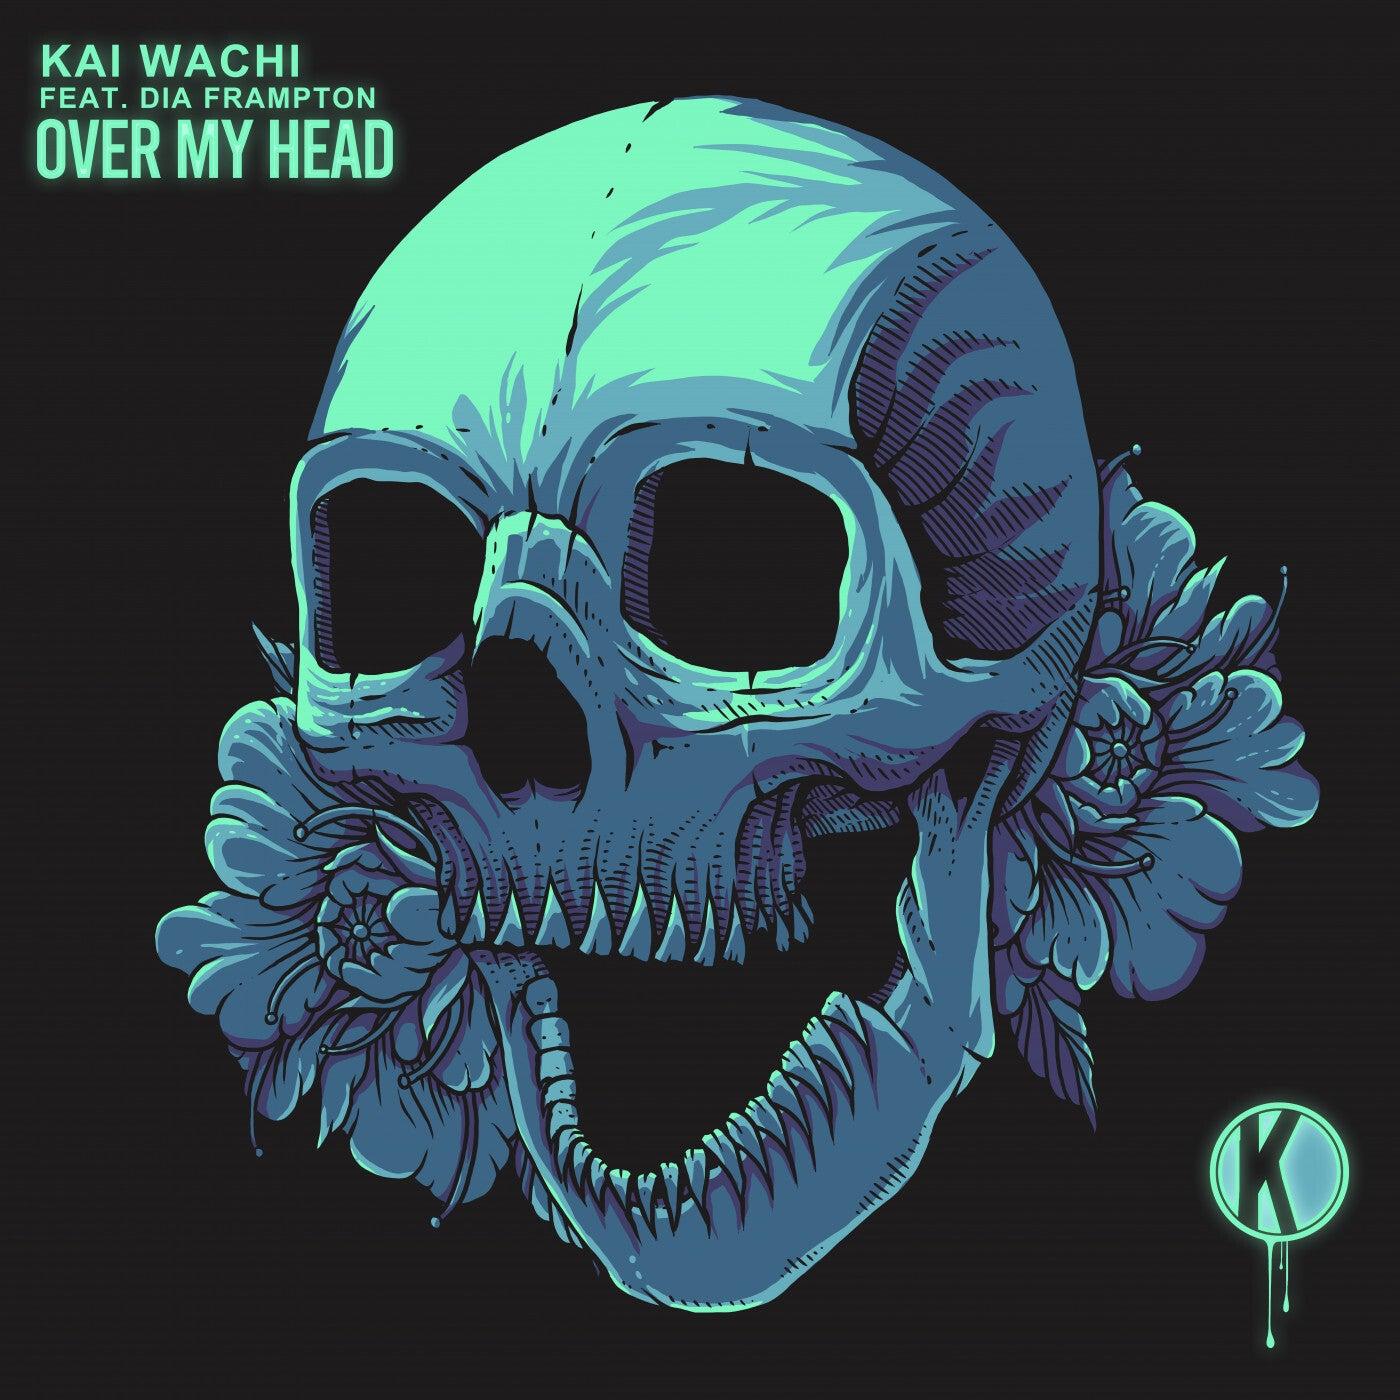 Over My Head (feat. Dia Frampton) (Original Mix)